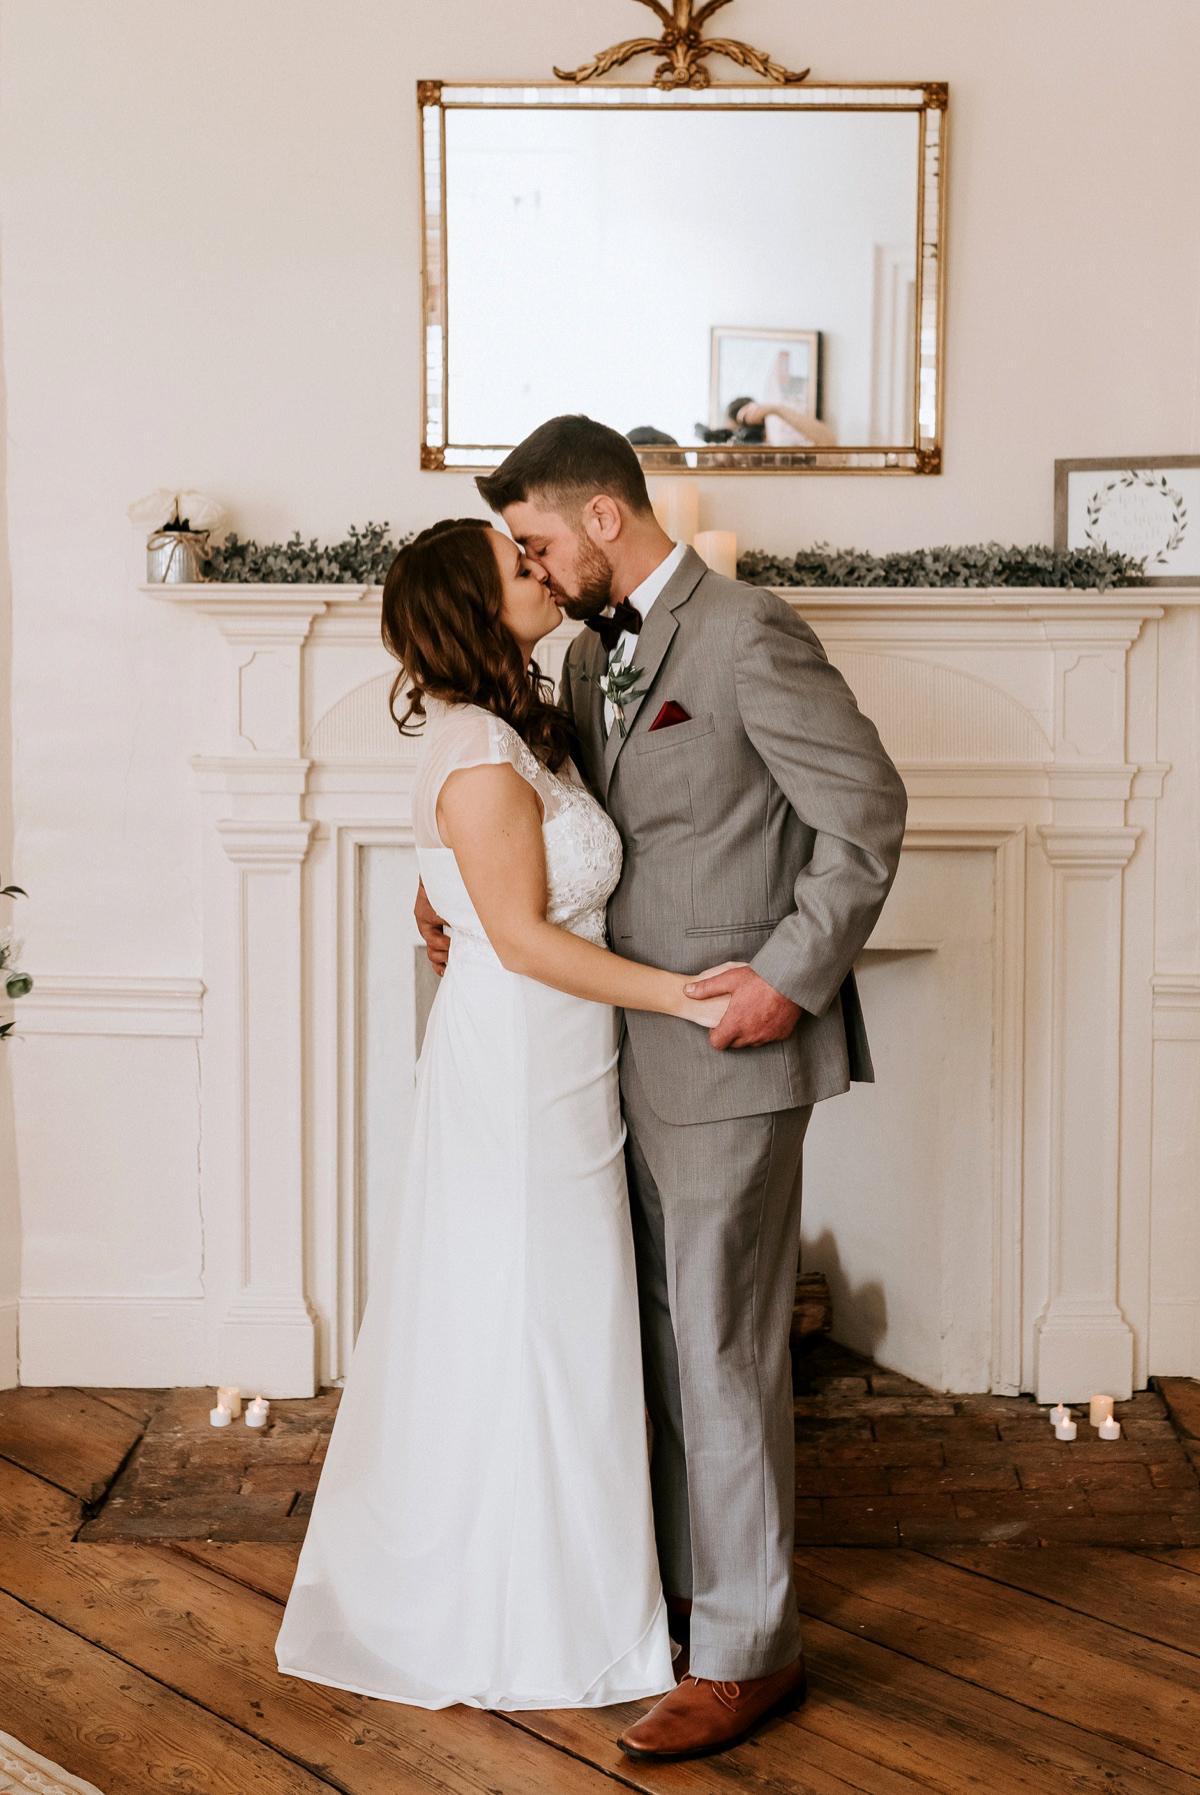 29 The Inn At Glencairn Destination Wedding Photographer Winter Elopement New Jersey Wedding Photographer Intimate Wedding